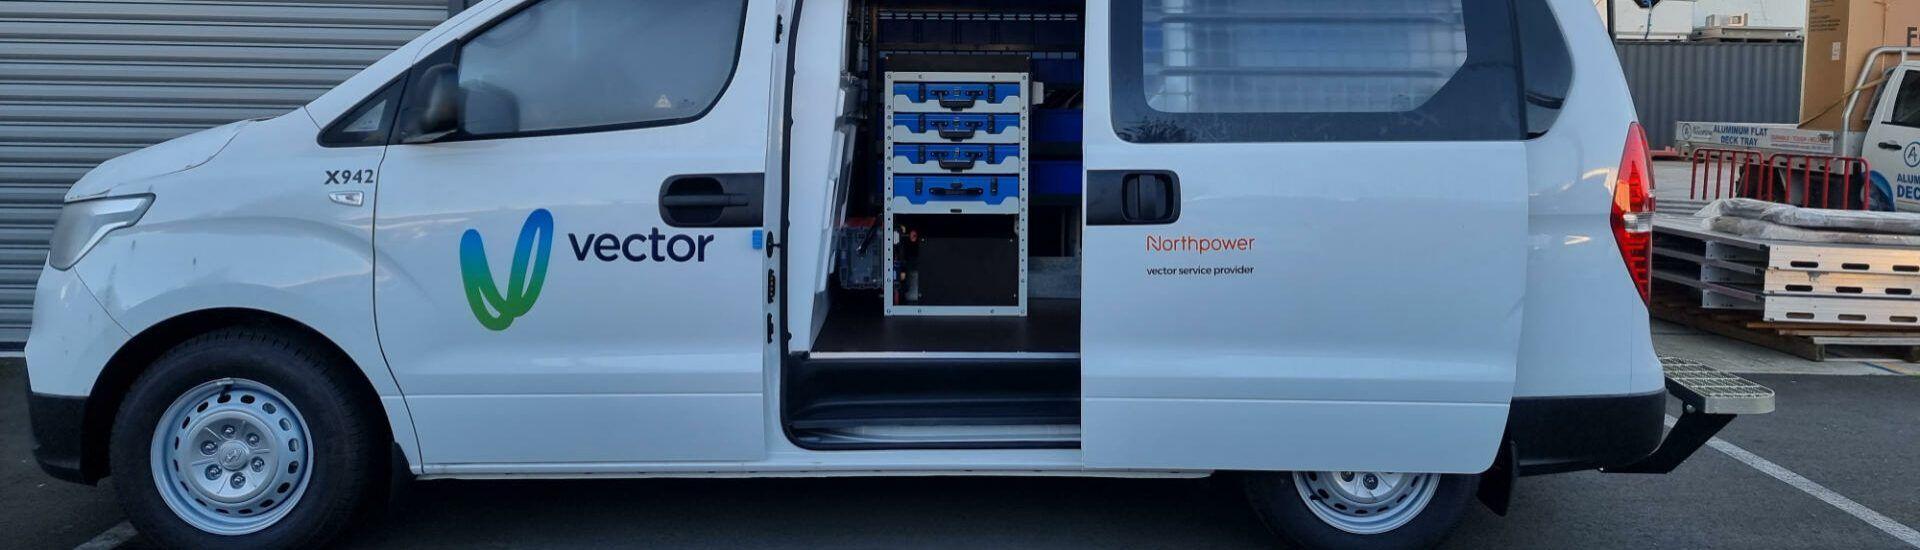 northpower iload van fitout